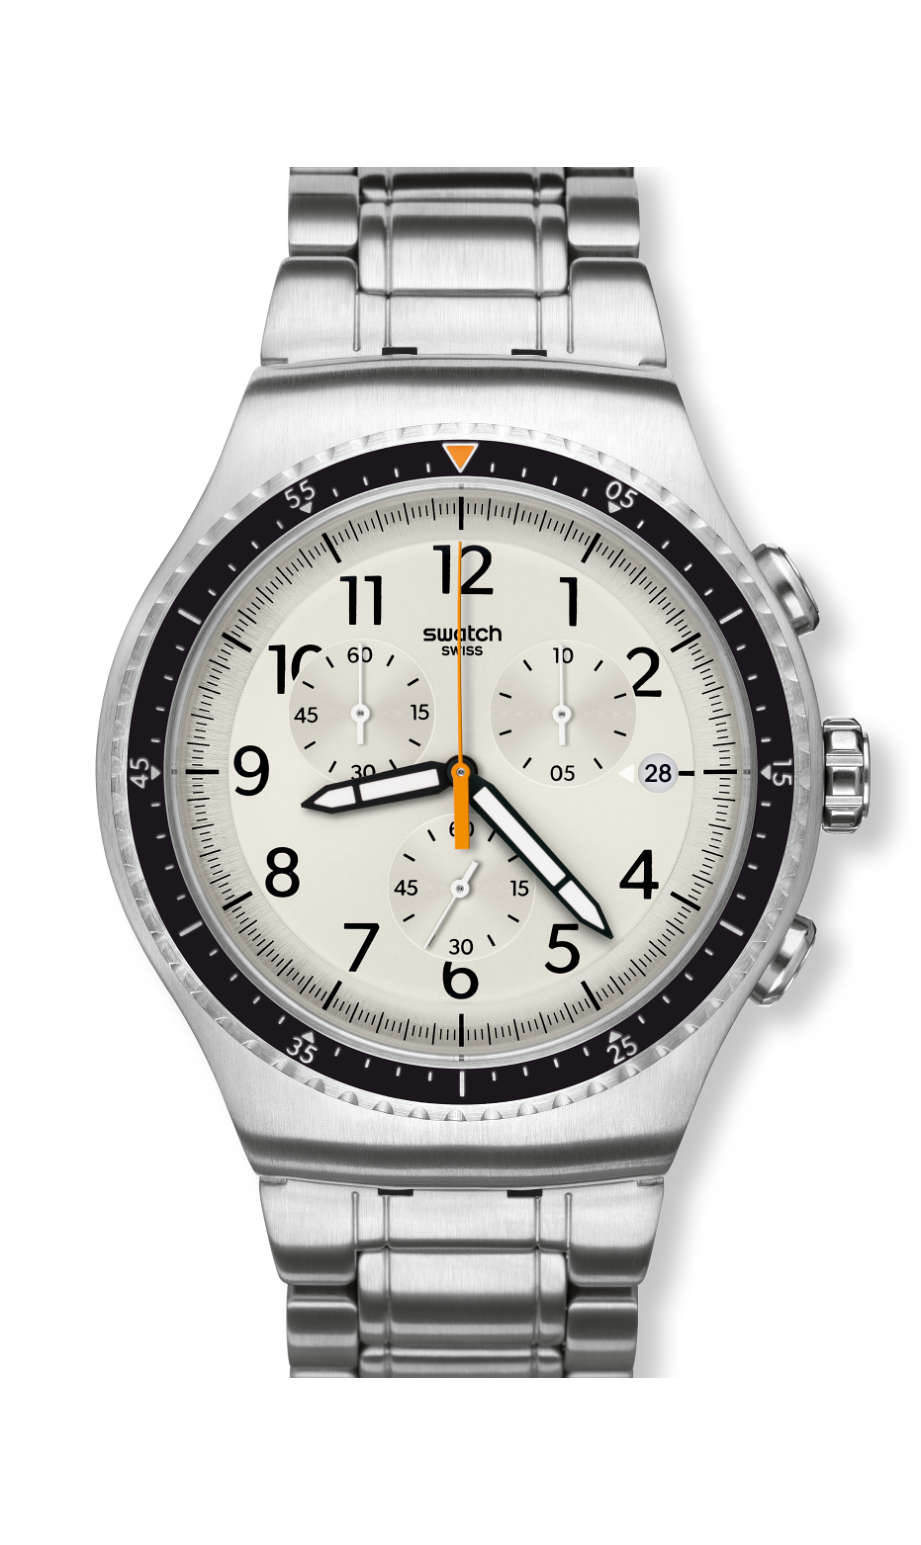 Swatch - MINIMALIS-TIC - 1